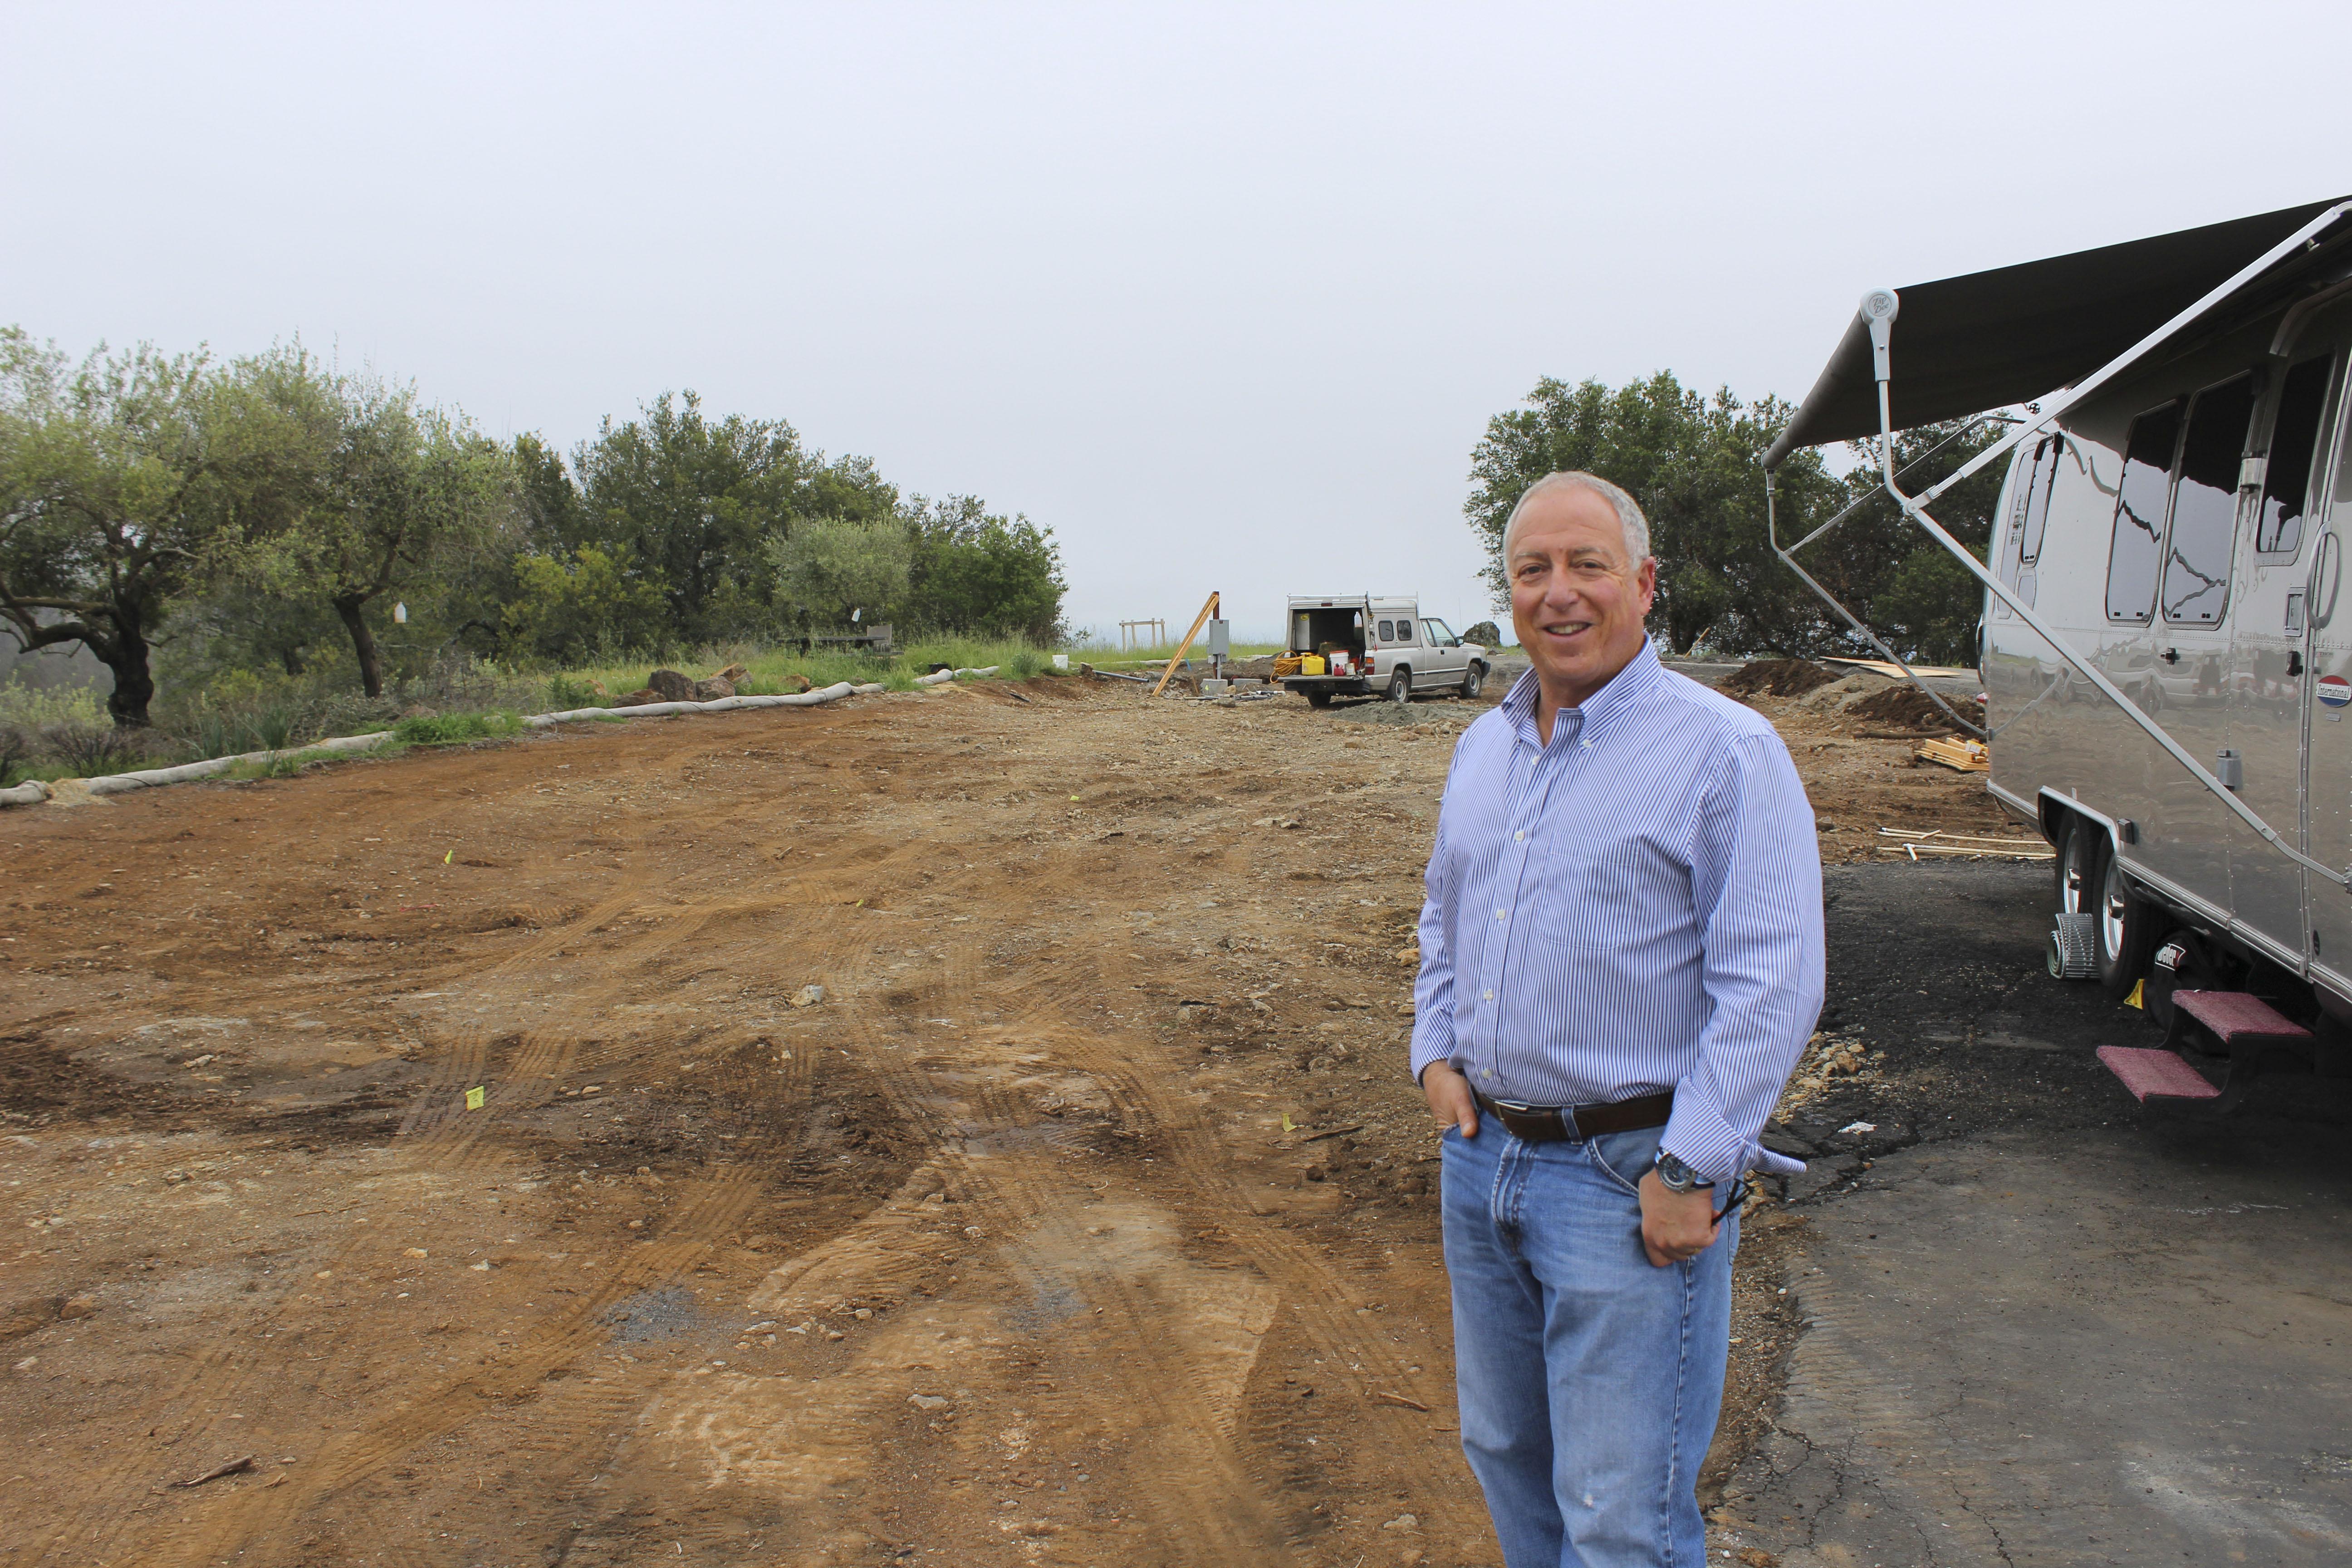 Jeremy Olsan on his property site north of Santa Rosa (Photo/Courtesy Olsan family)